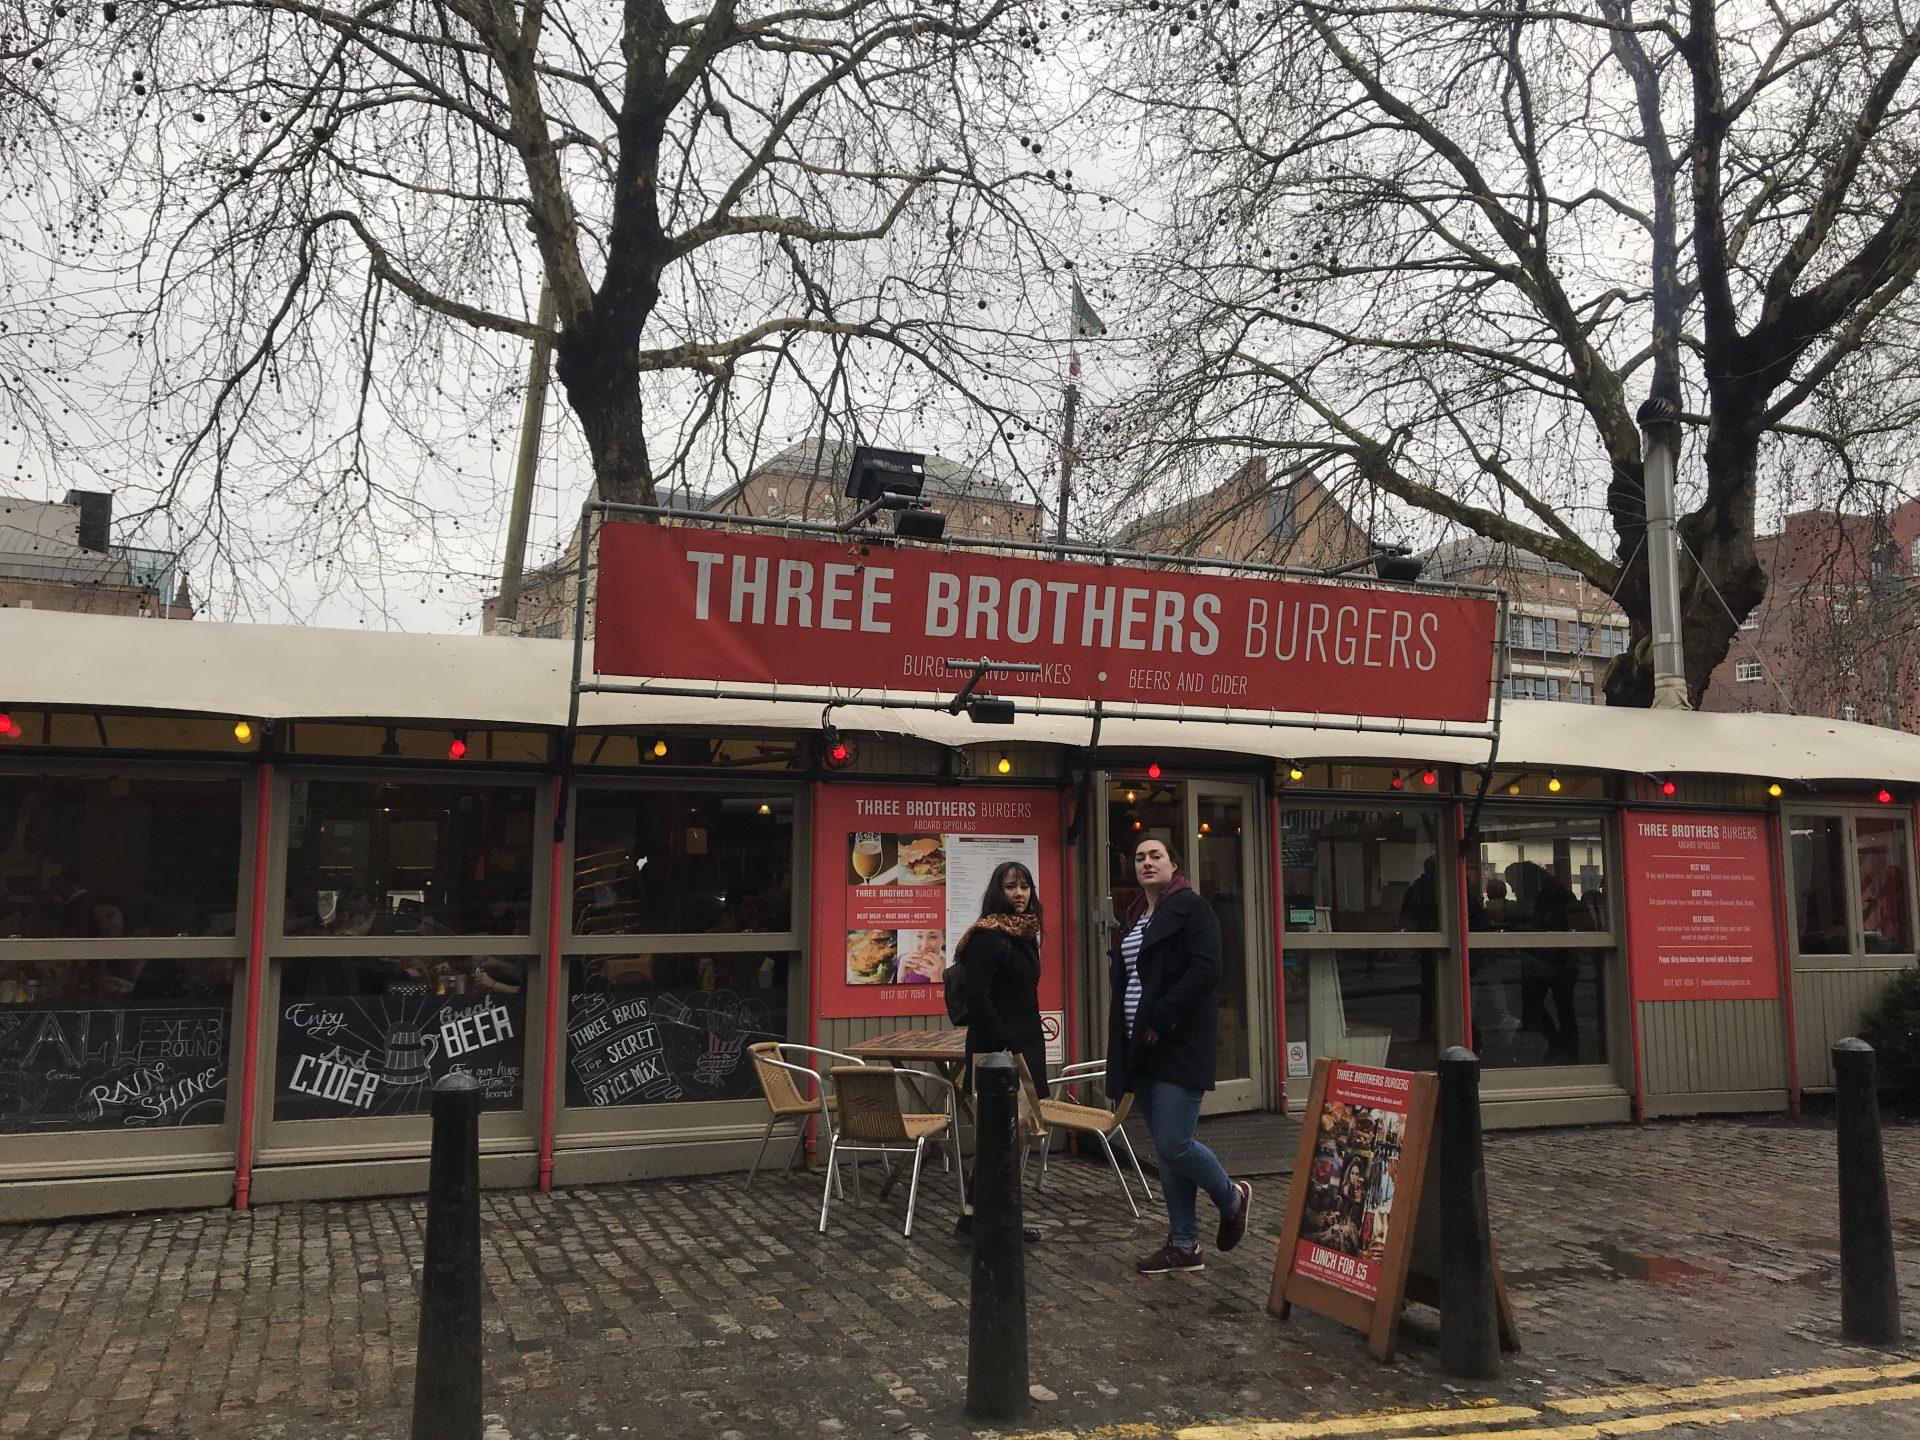 Three Brothers Burgers